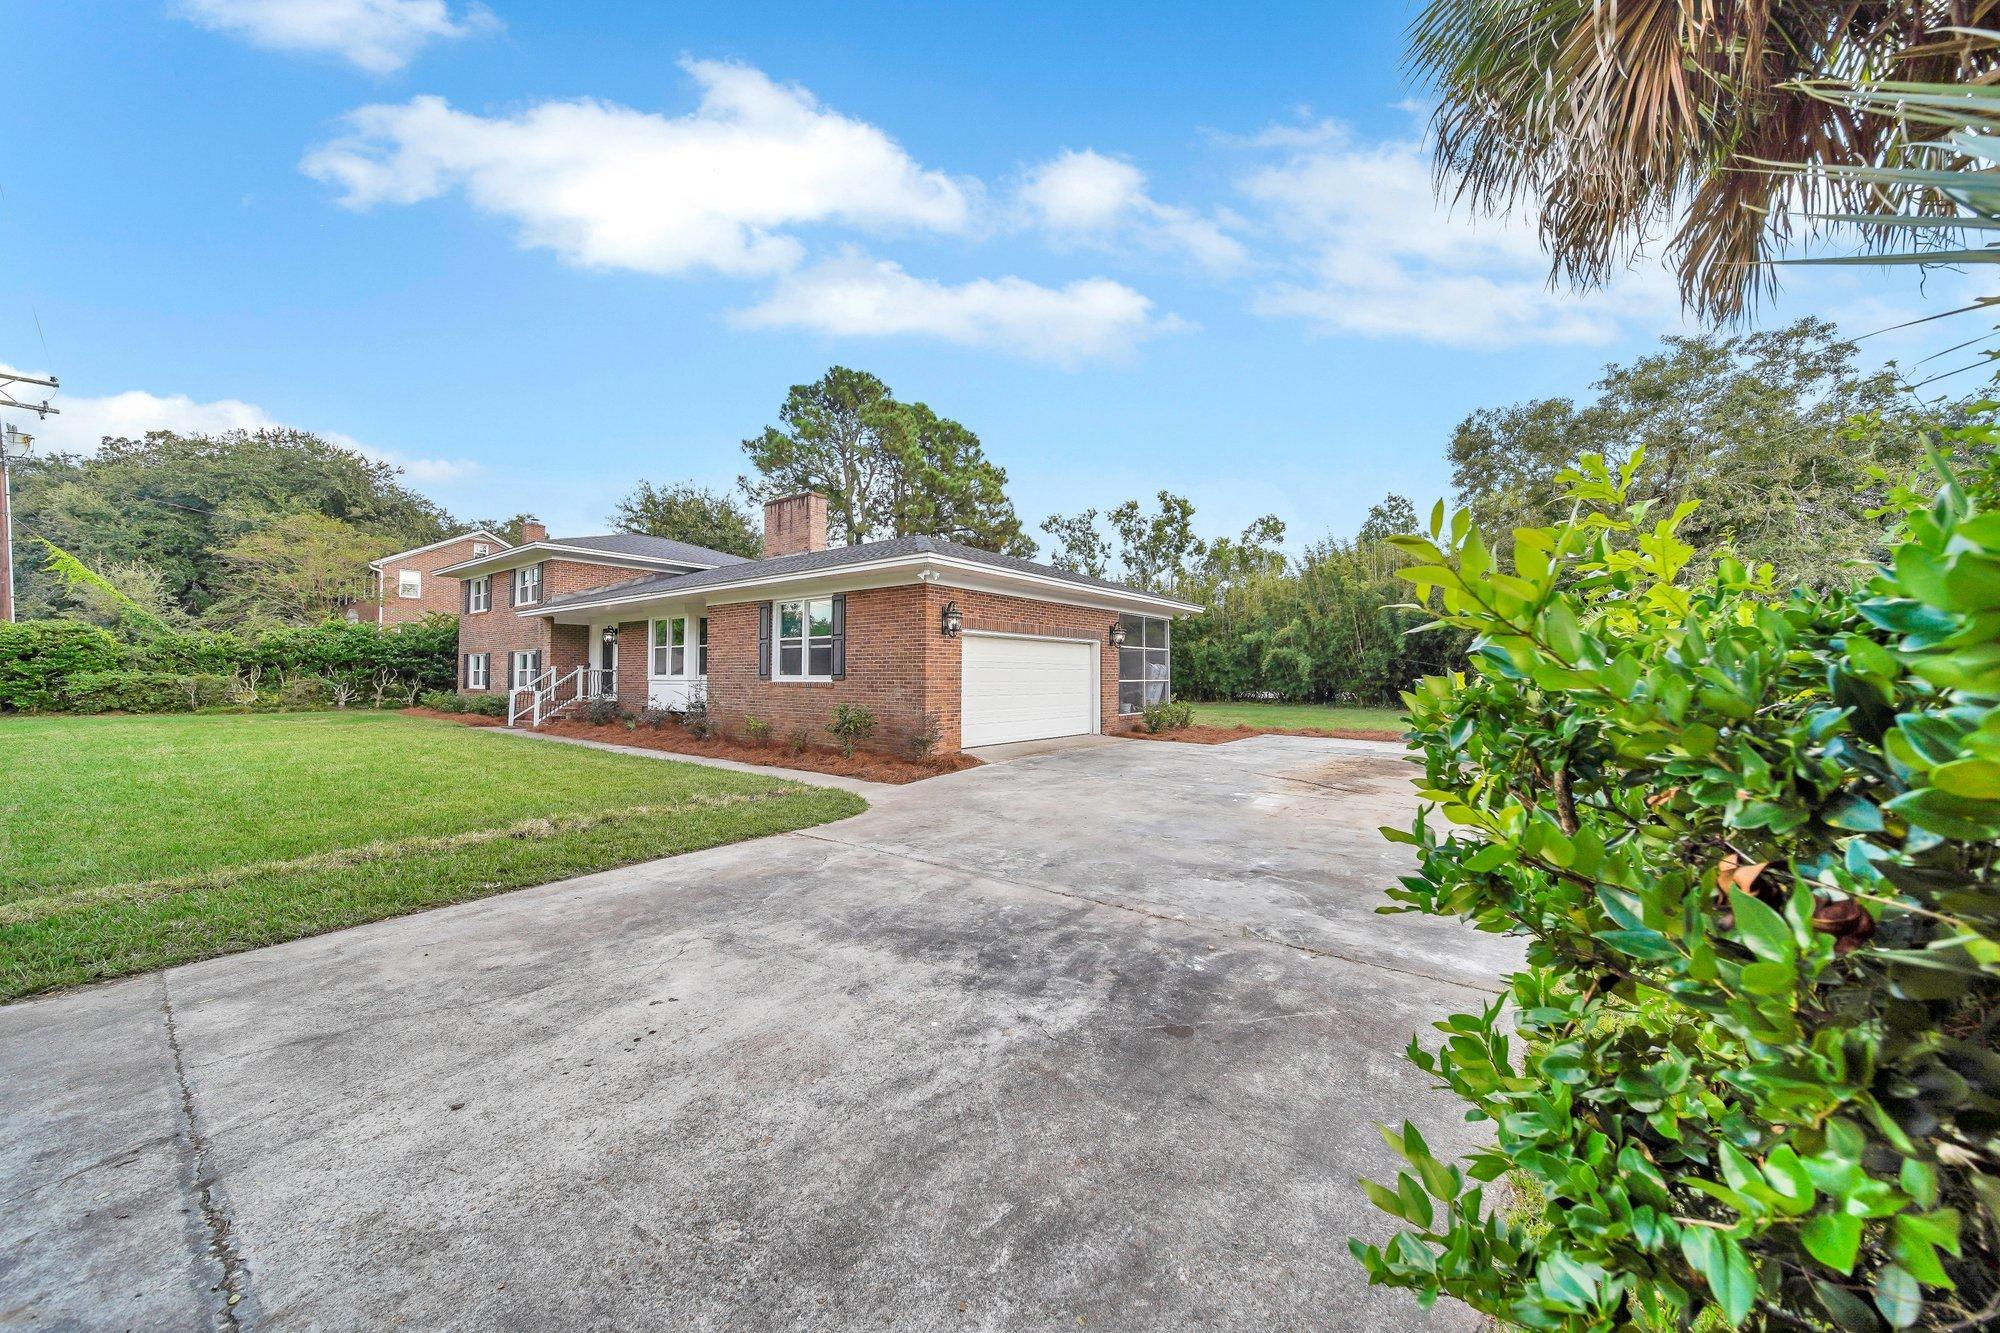 Country Club II Homes For Sale - 1477 Burningtree, Charleston, SC - 18